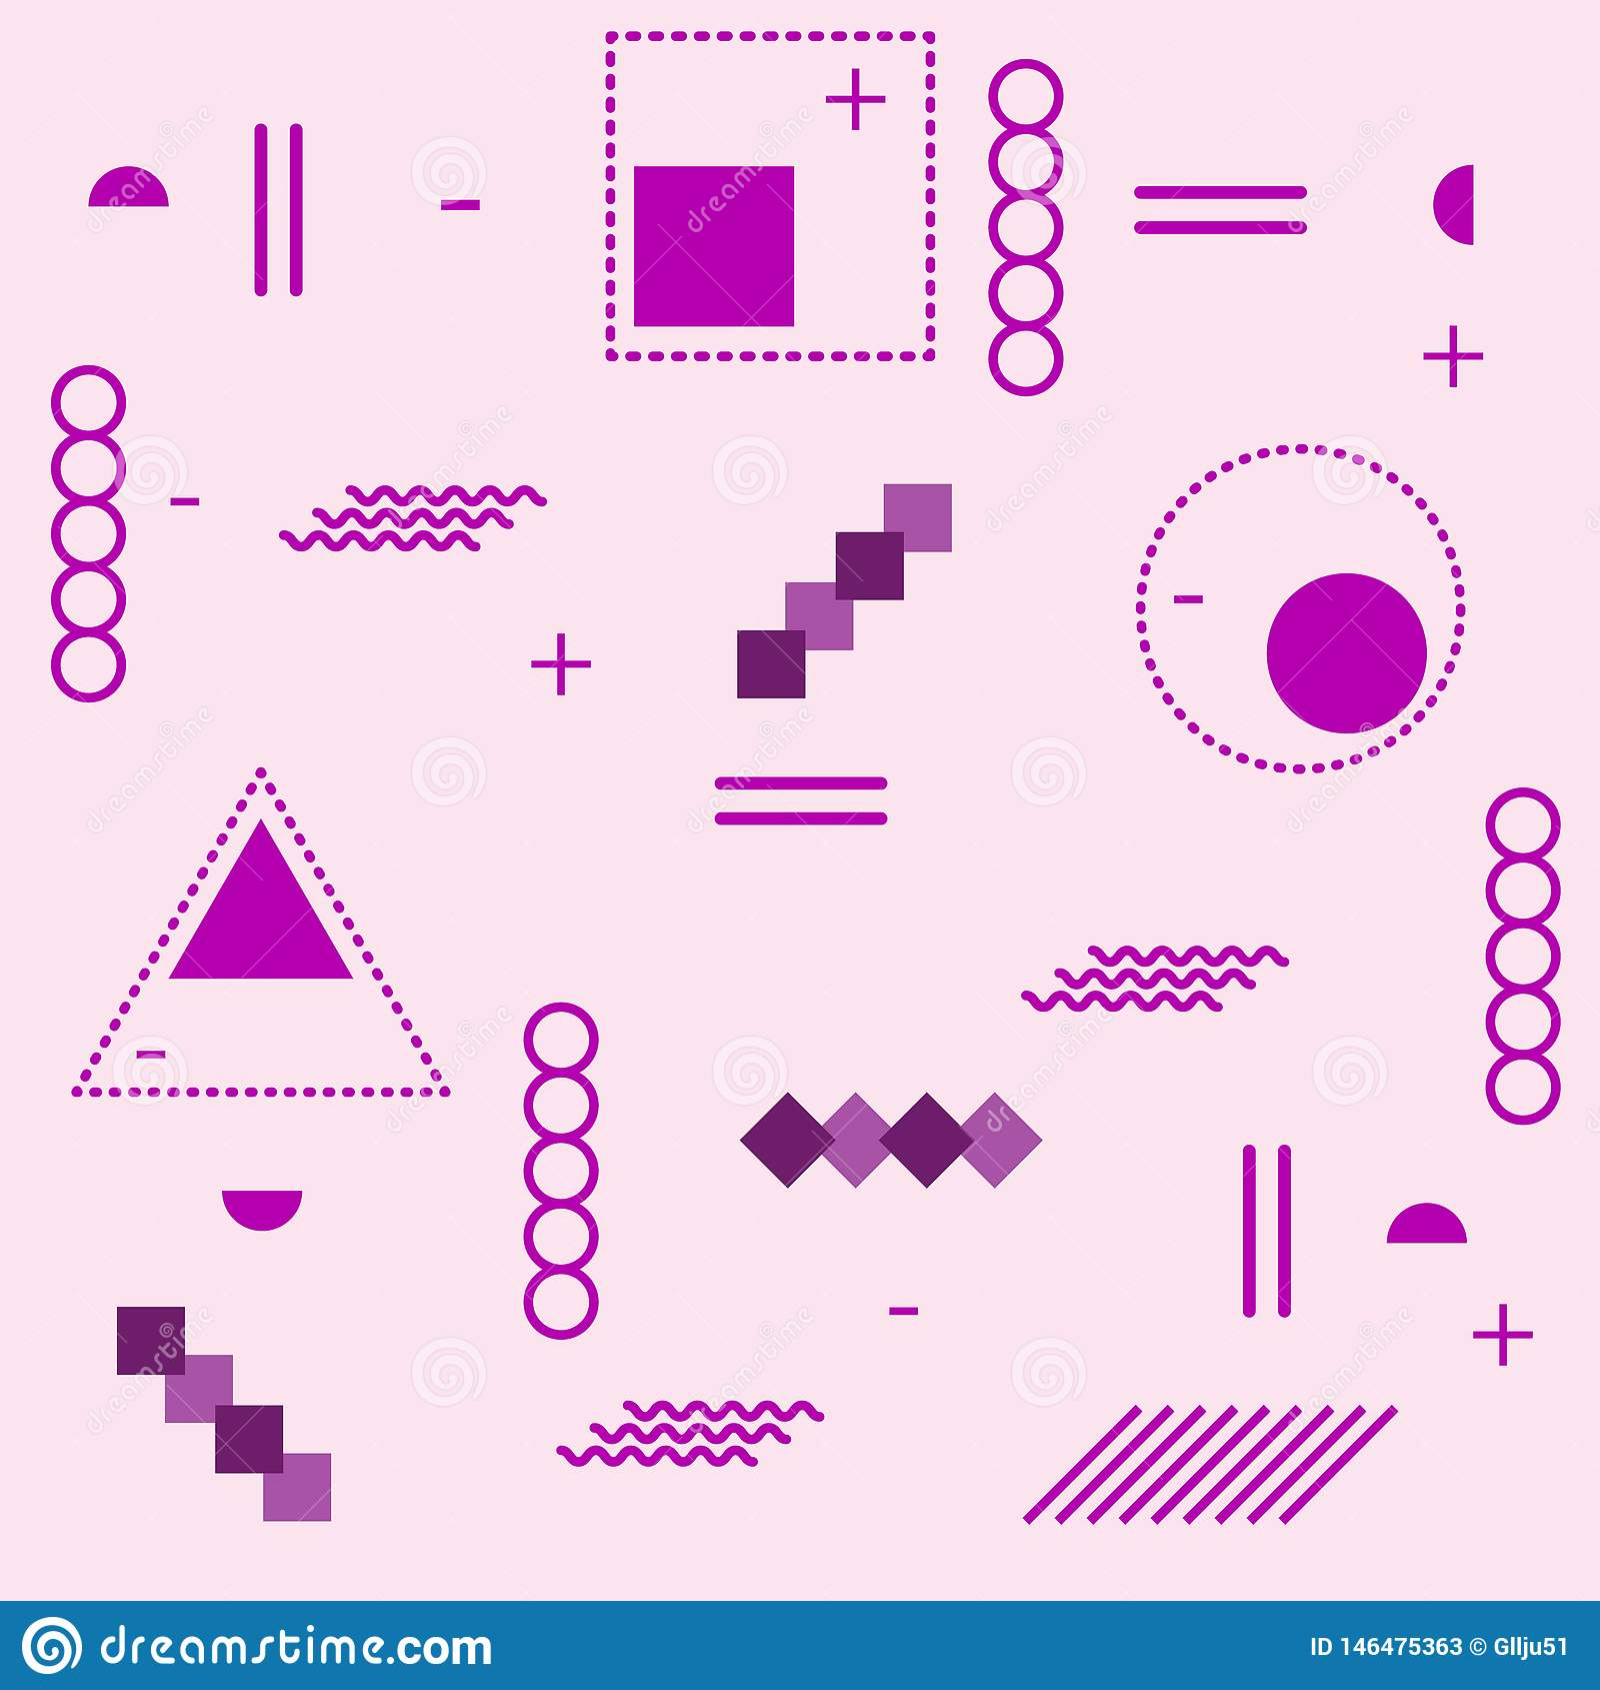 Trendy Poster Designs: Trendy Geometric Elements Memphis Cards. Retro Style